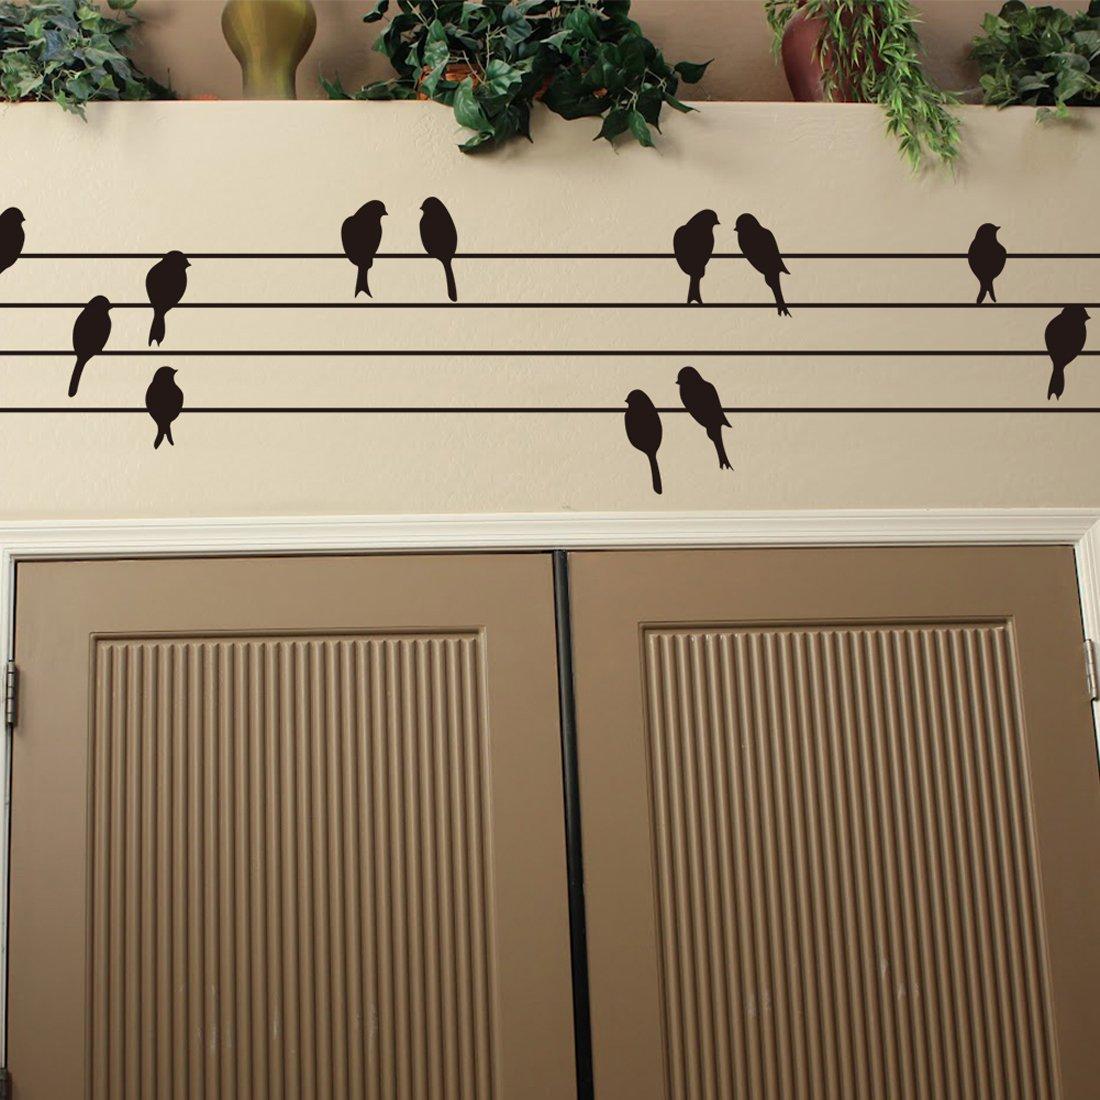 joyliveCY CY-buity 30/* 115/cm p/ájaros sobre cables sala de estar moderna pared arte Mural adhesivo presente regalo